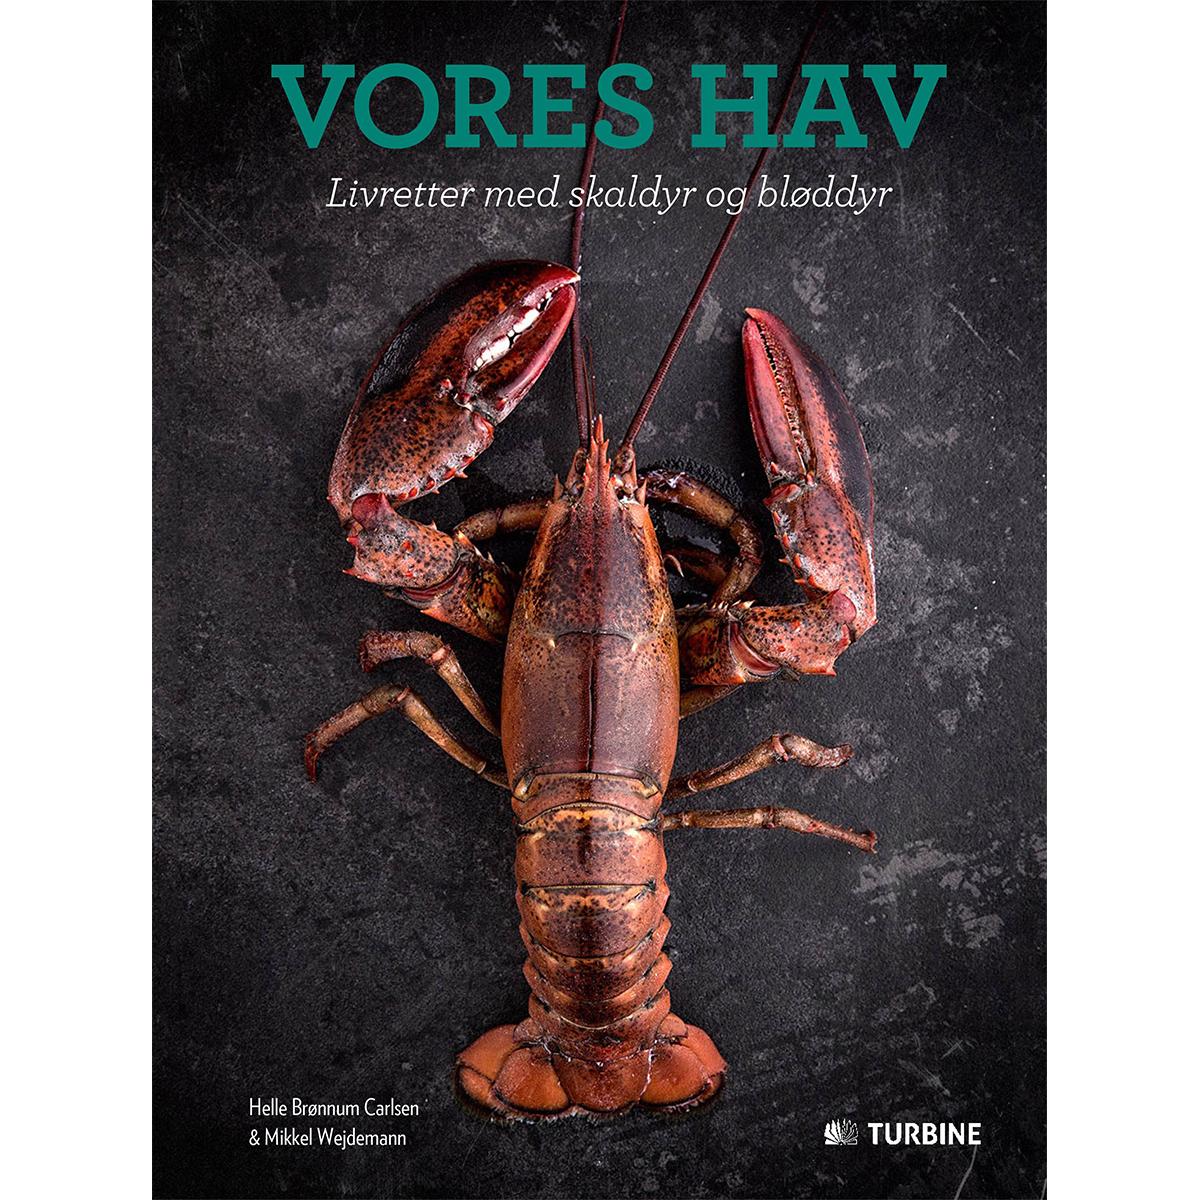 Image of   Vores hav - Livrettet med skaldyr og bløddyr - Hardback